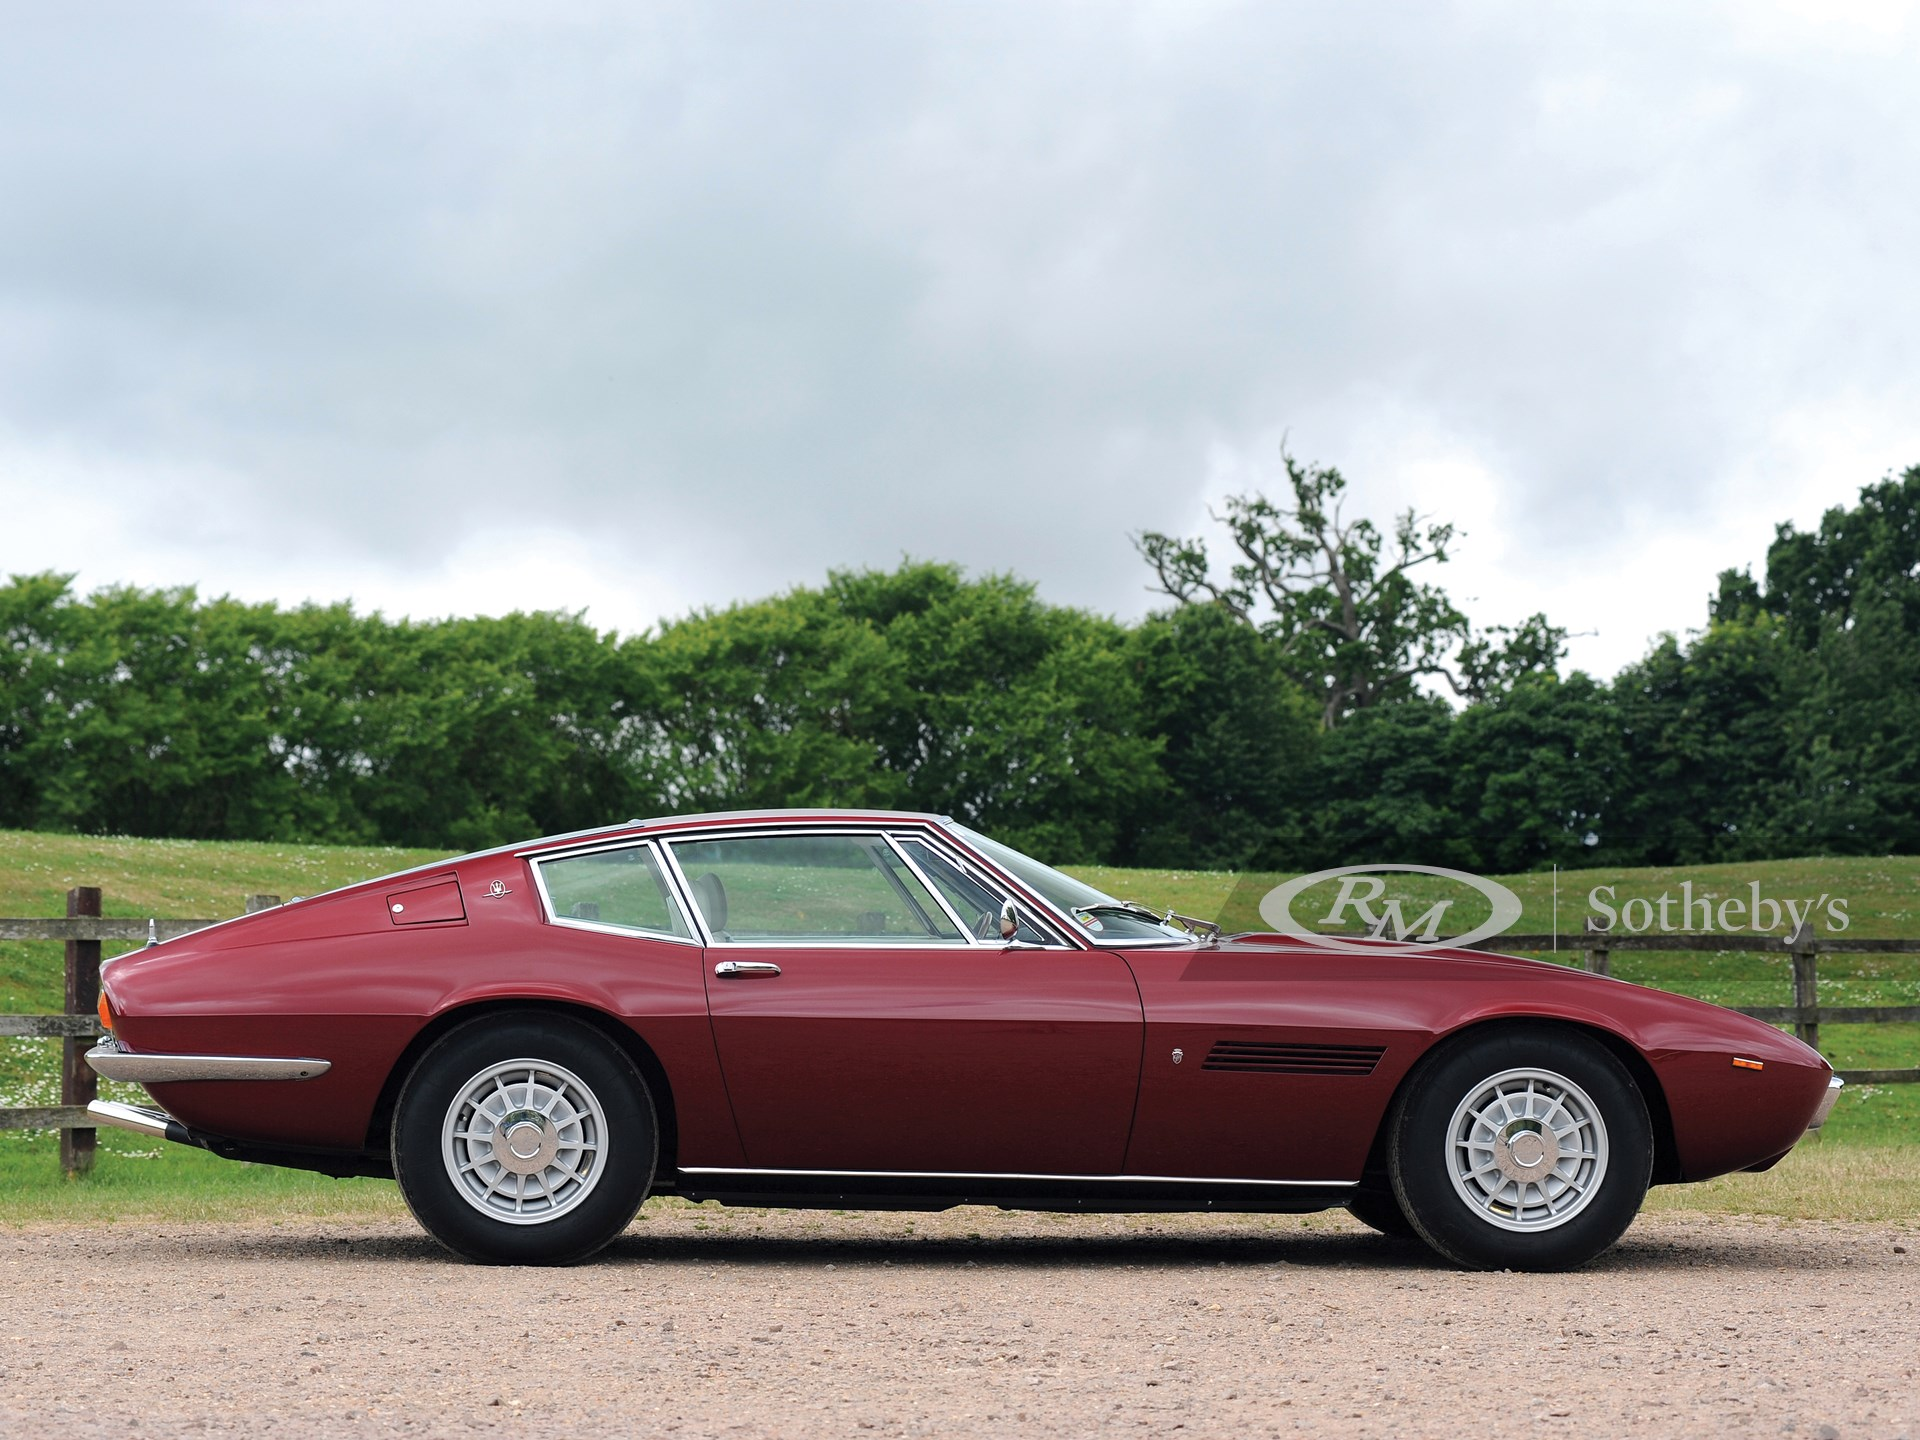 1970 Maserati Ghibli SS 4.9 Coupé by Ghia | London 2018 ...